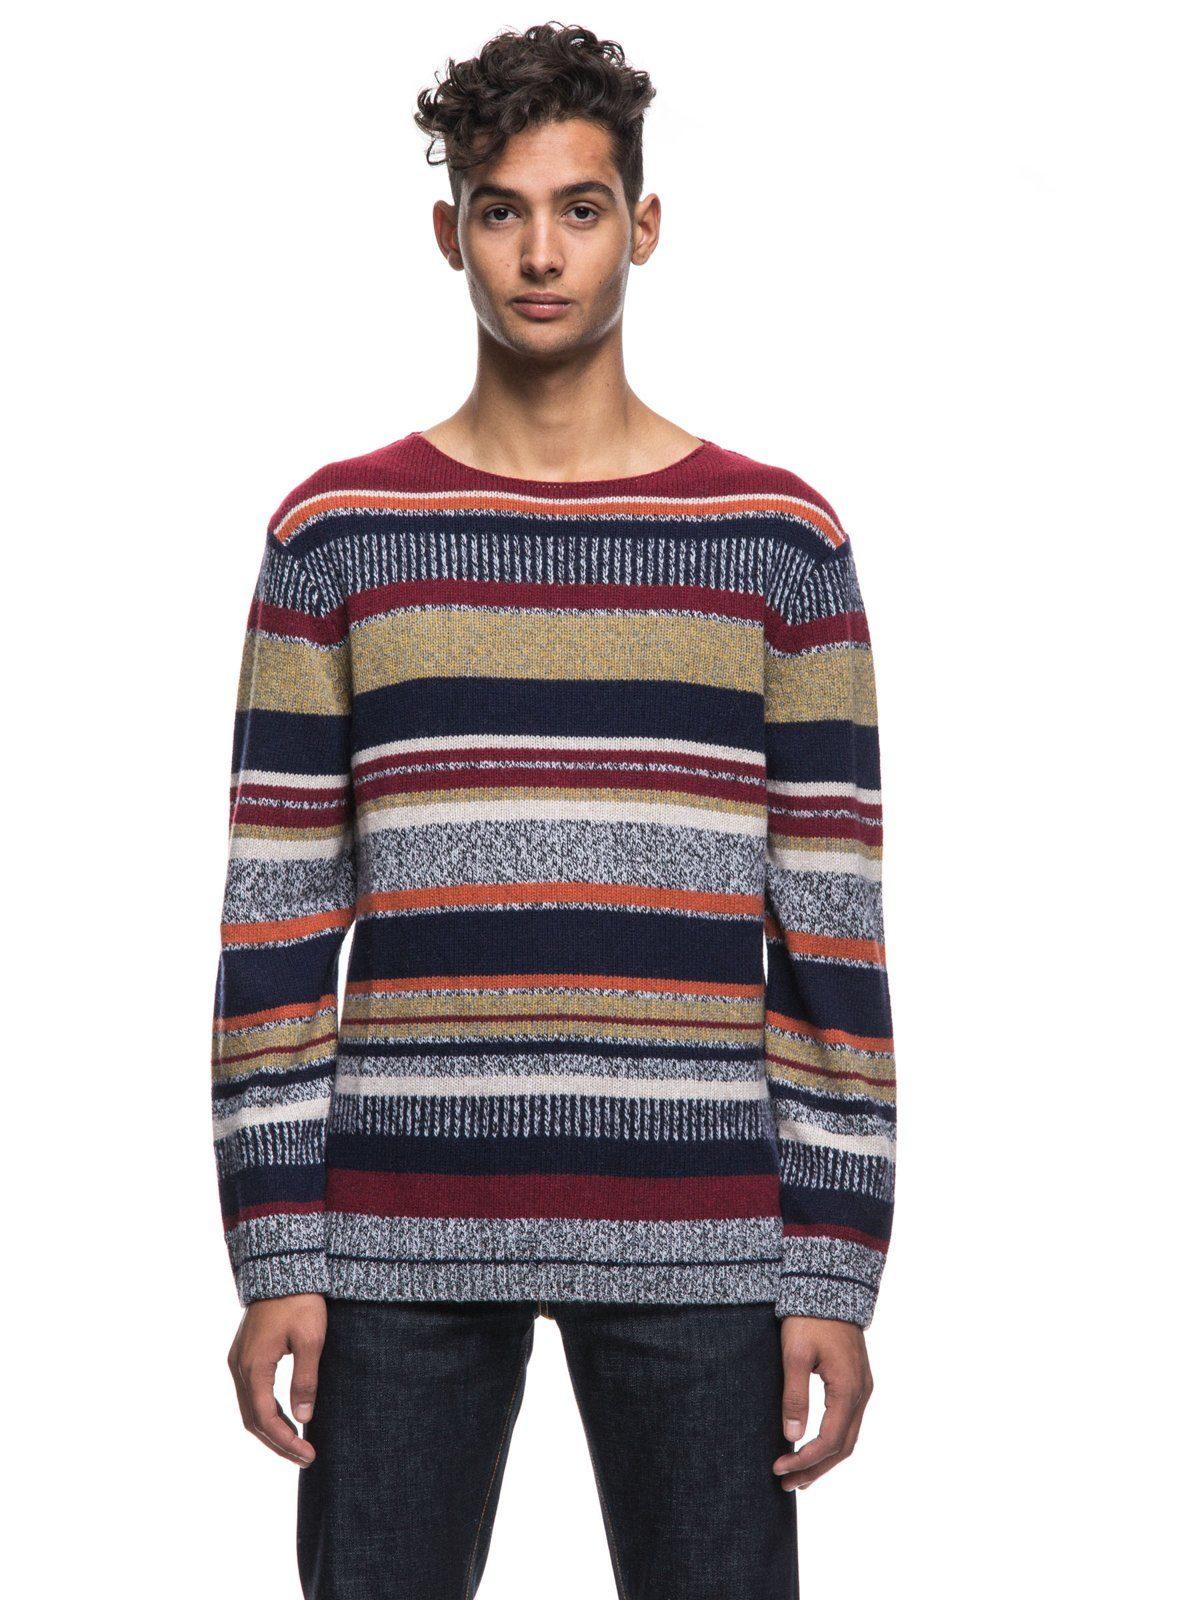 Tor-Tweed-Stripe-Multi-150338R22-01-primary_1600x1600